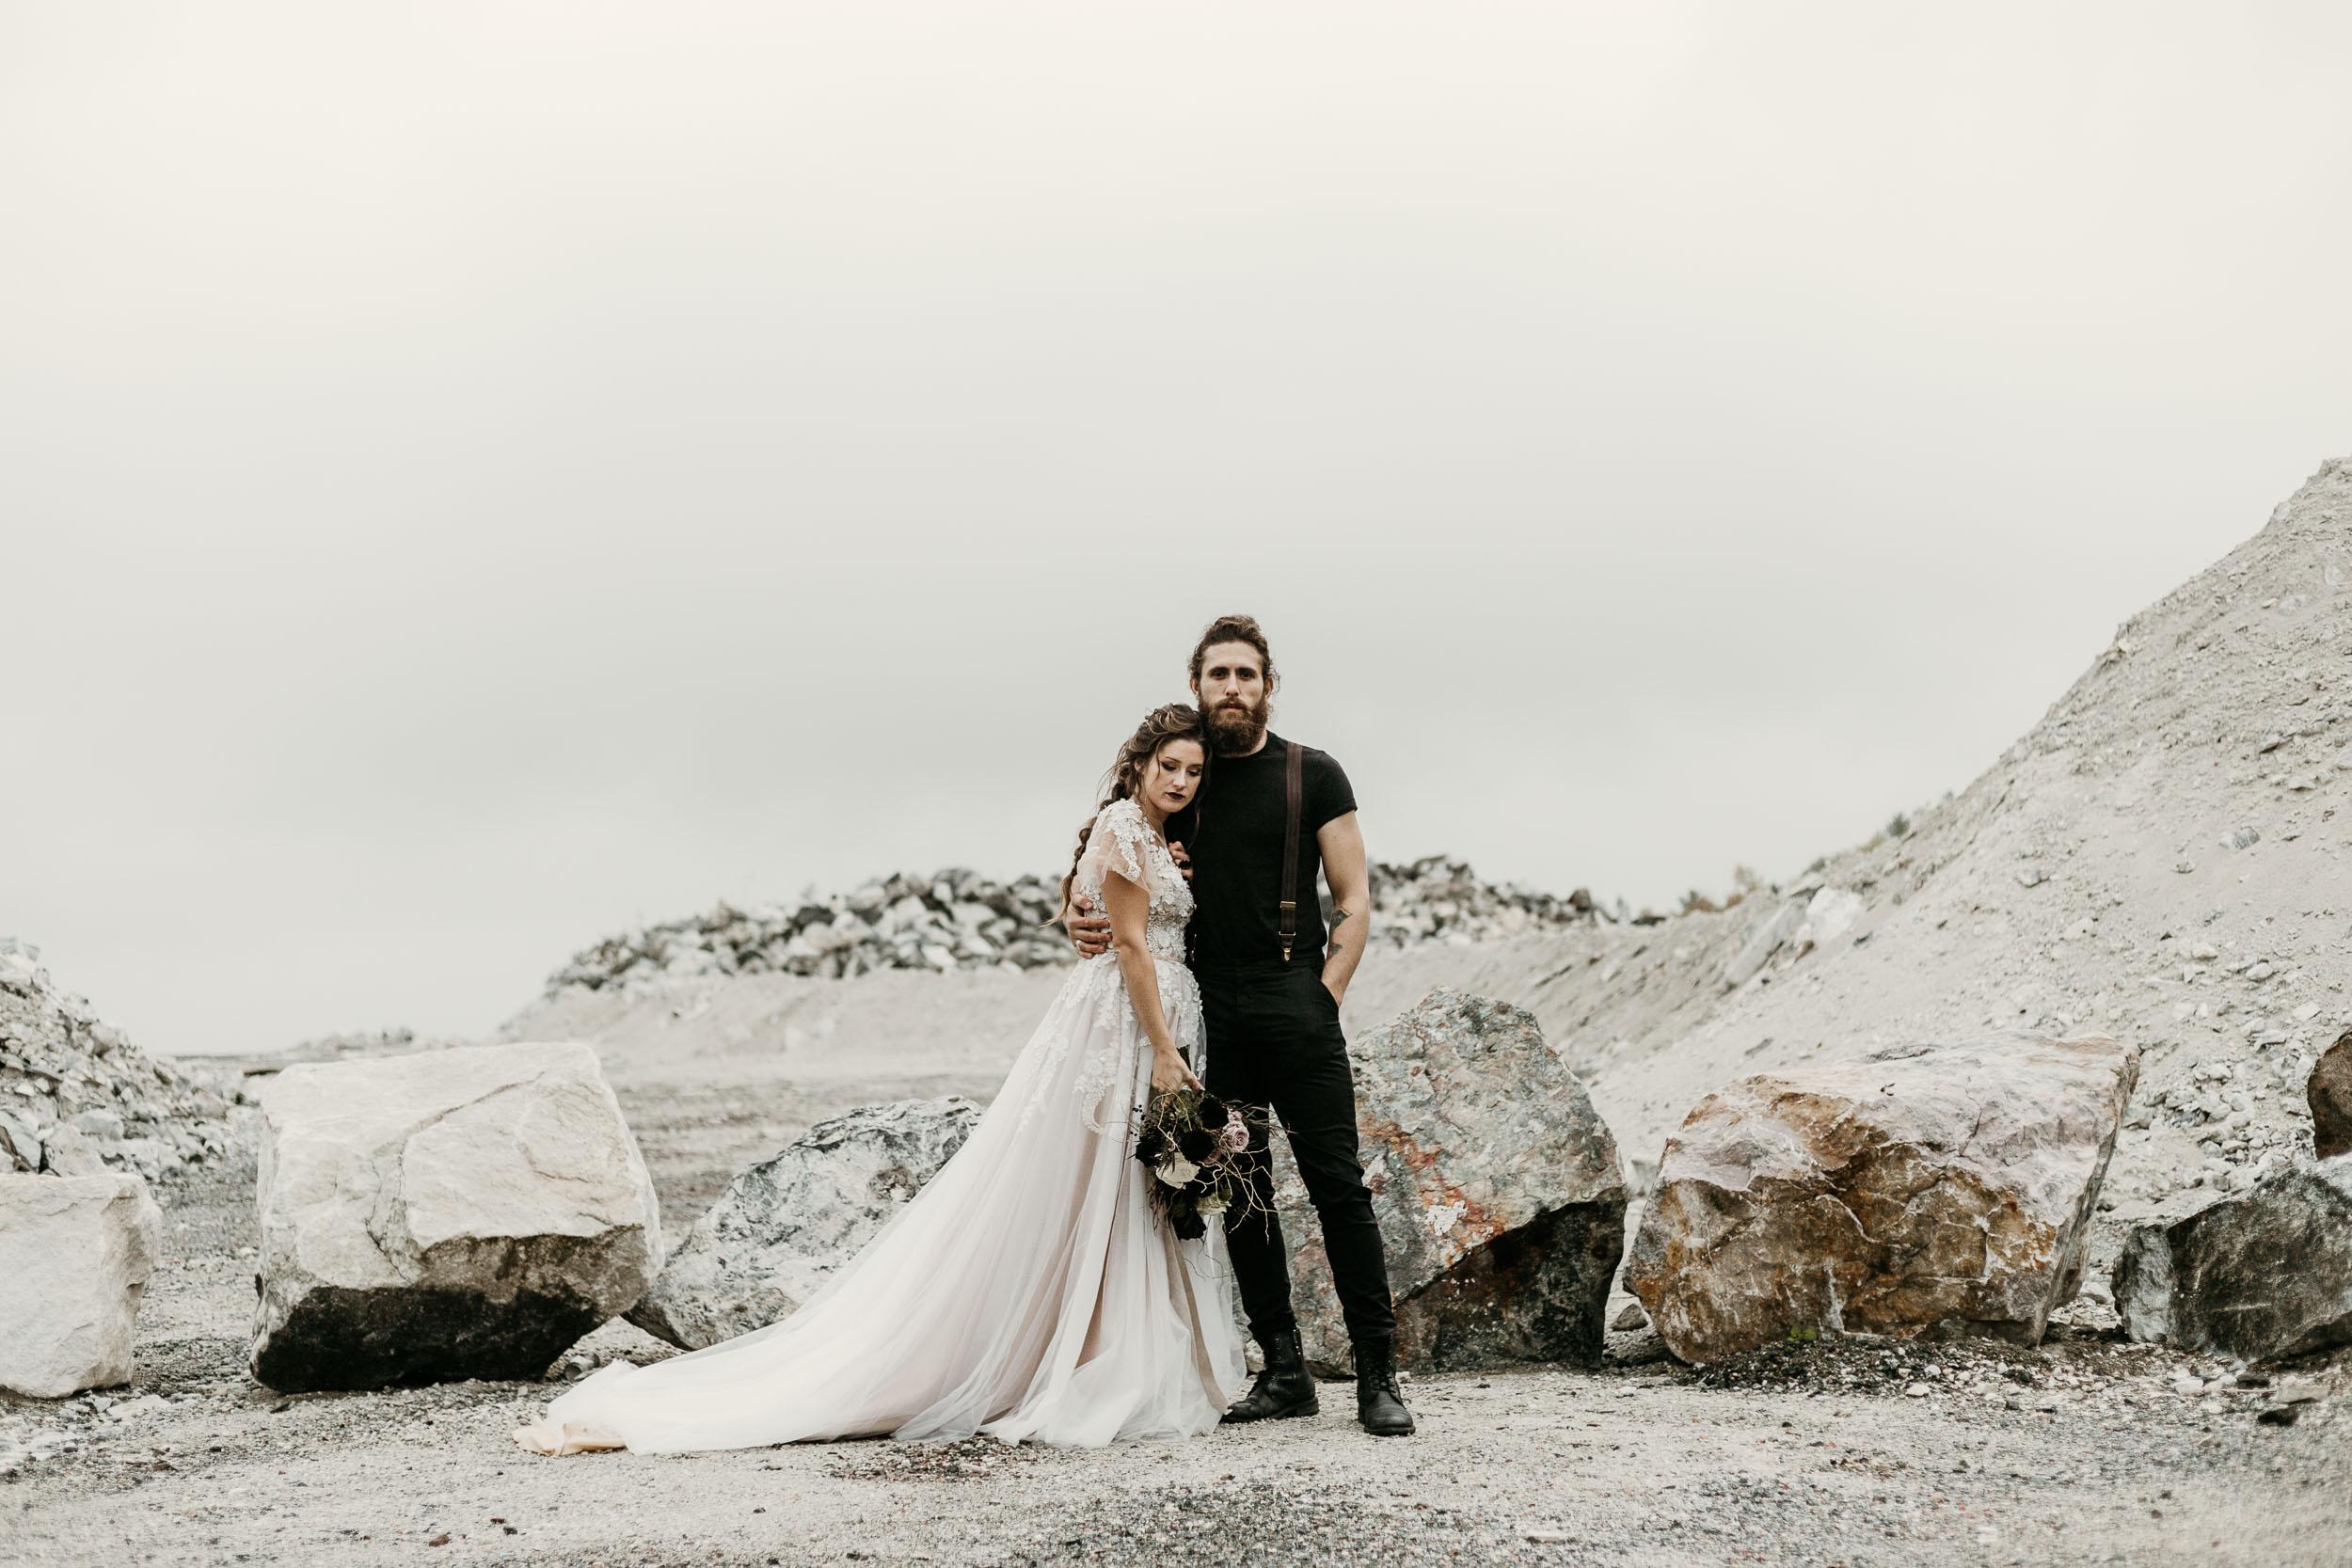 intimate-wedding-elopement-photographer-ottawa-toronto-1042.jpg